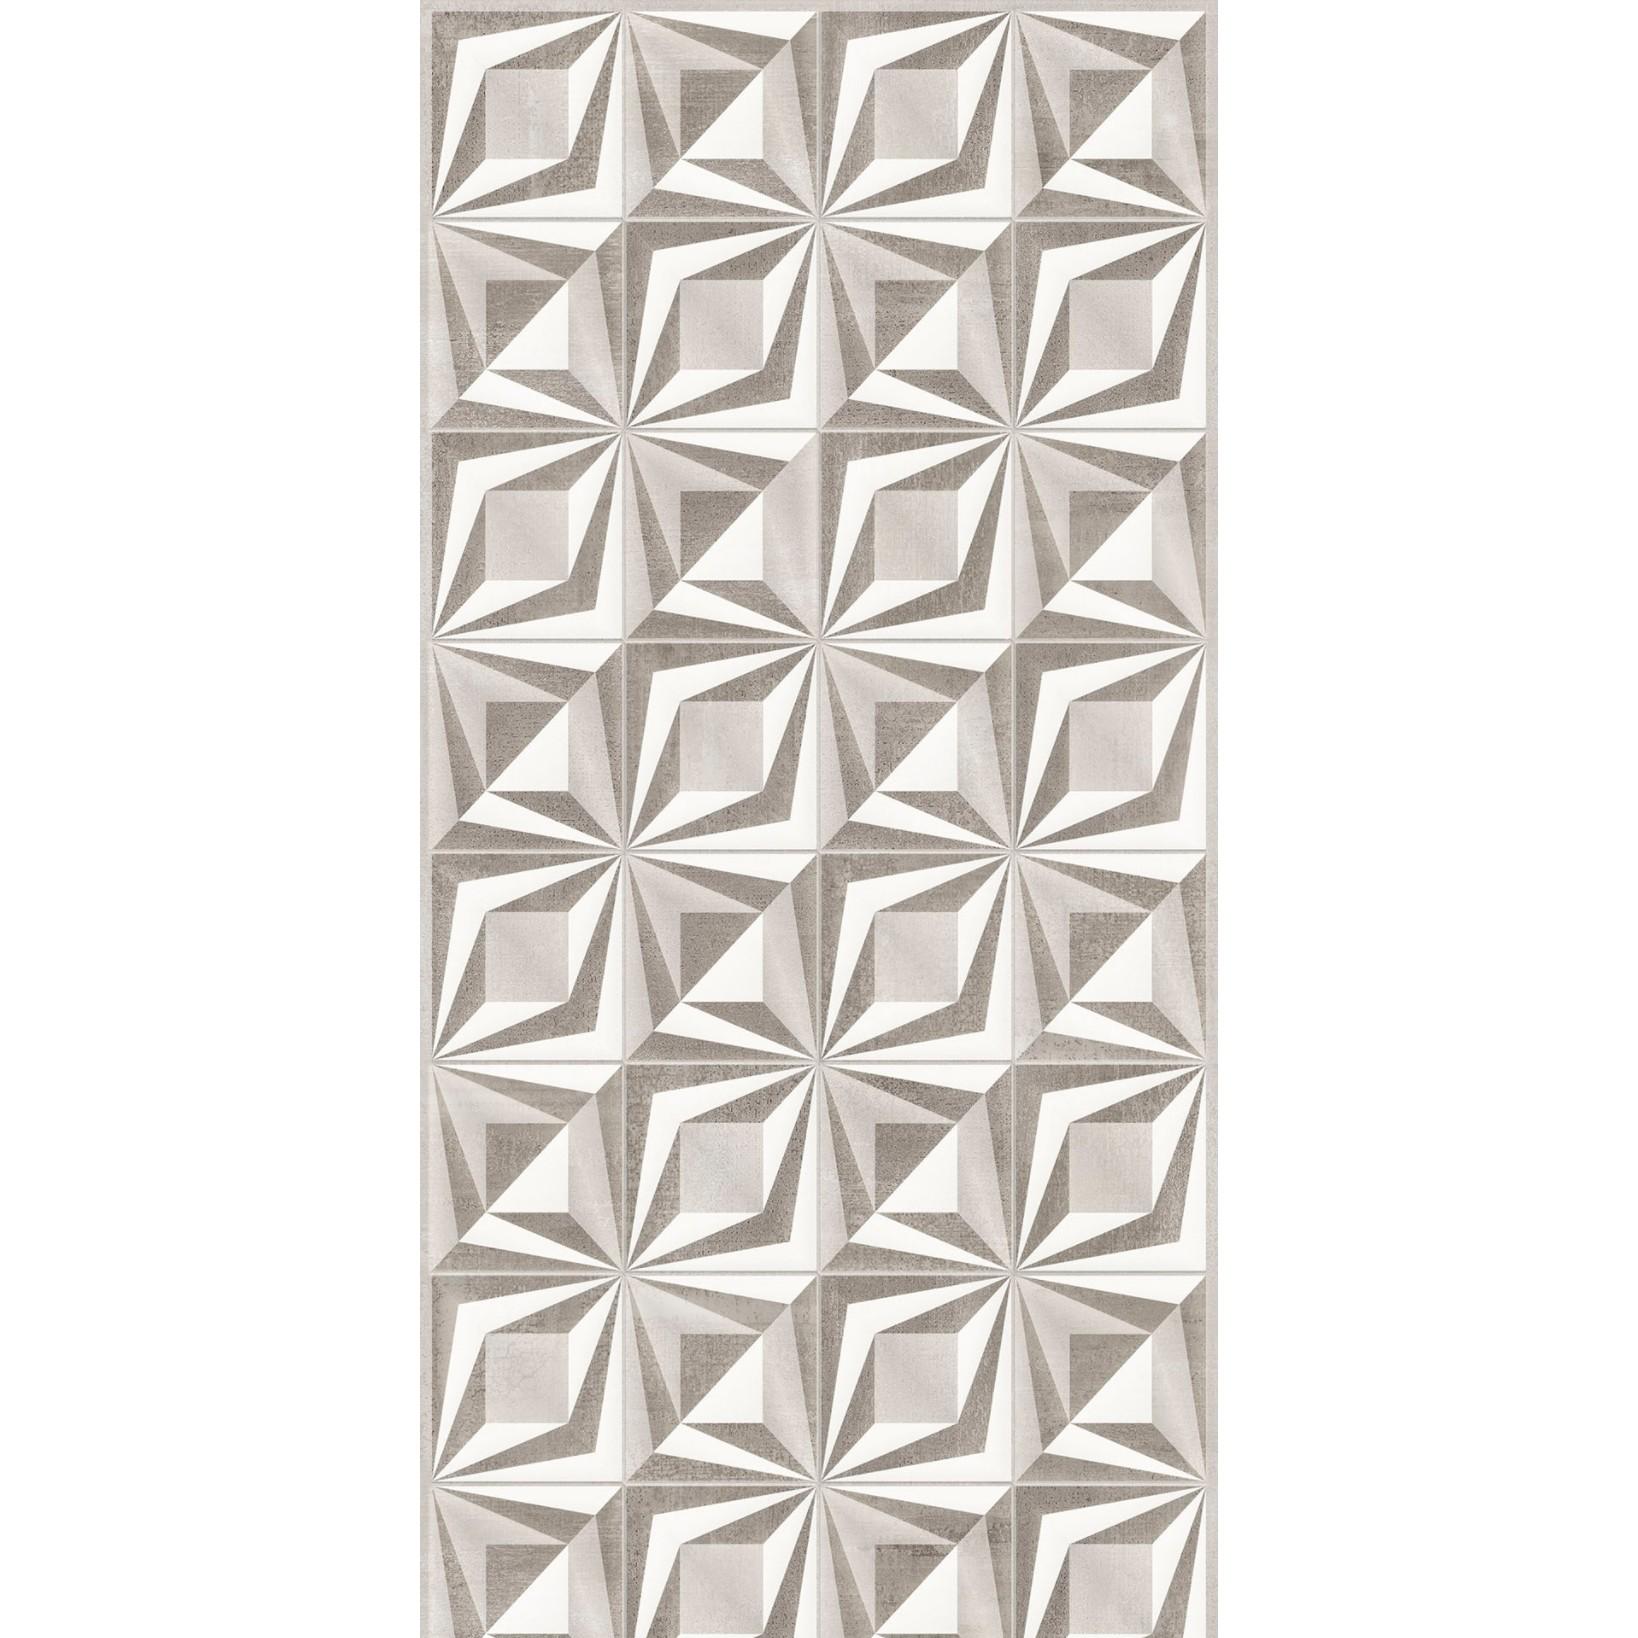 Revestimento Tipo A Damond Retangular 46x100 cm 280m - Embramaco